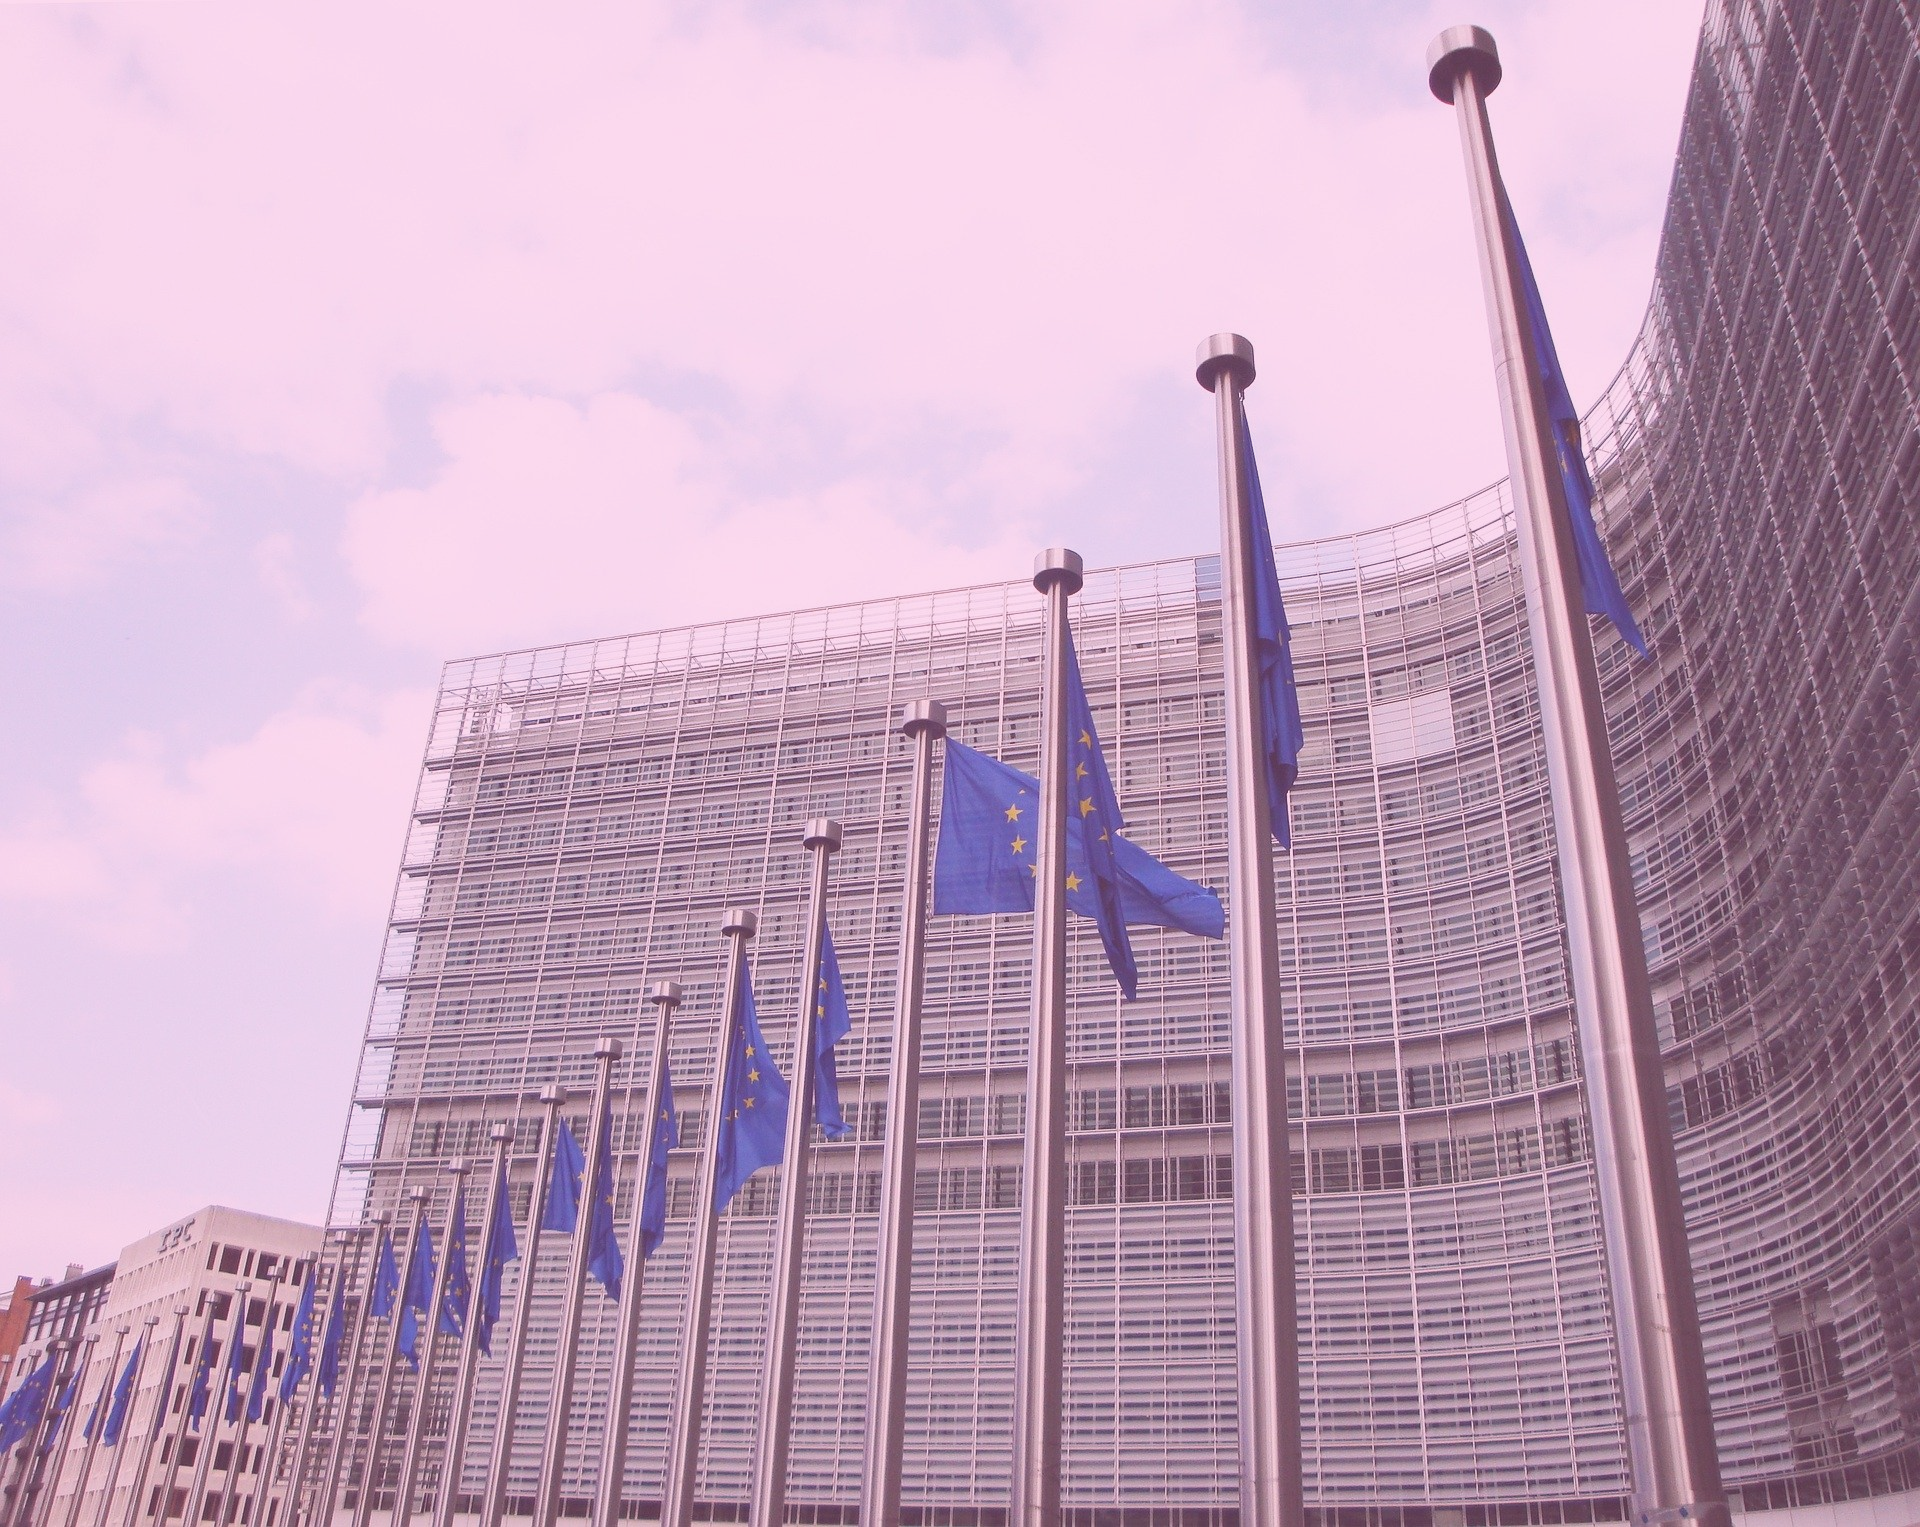 Wouter van der Brug, Sebastian Adrian Popa, Sara B Hobolt, Hermann Schmitt – Illiberal democratic attitudes and support for the EU